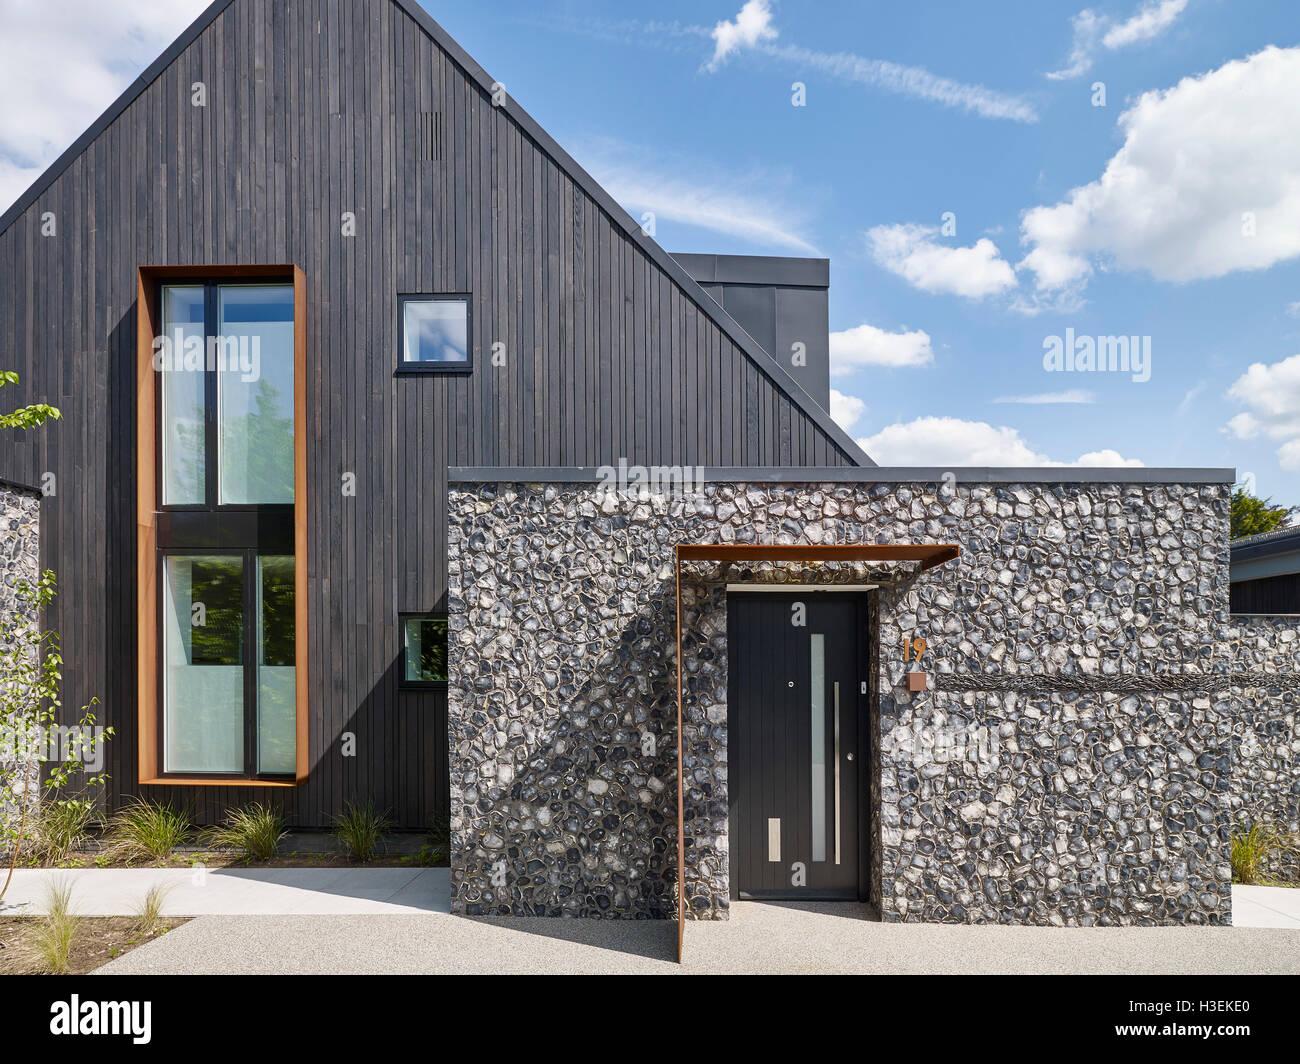 Wood Elevation Uk : Corten steel and home stock photos